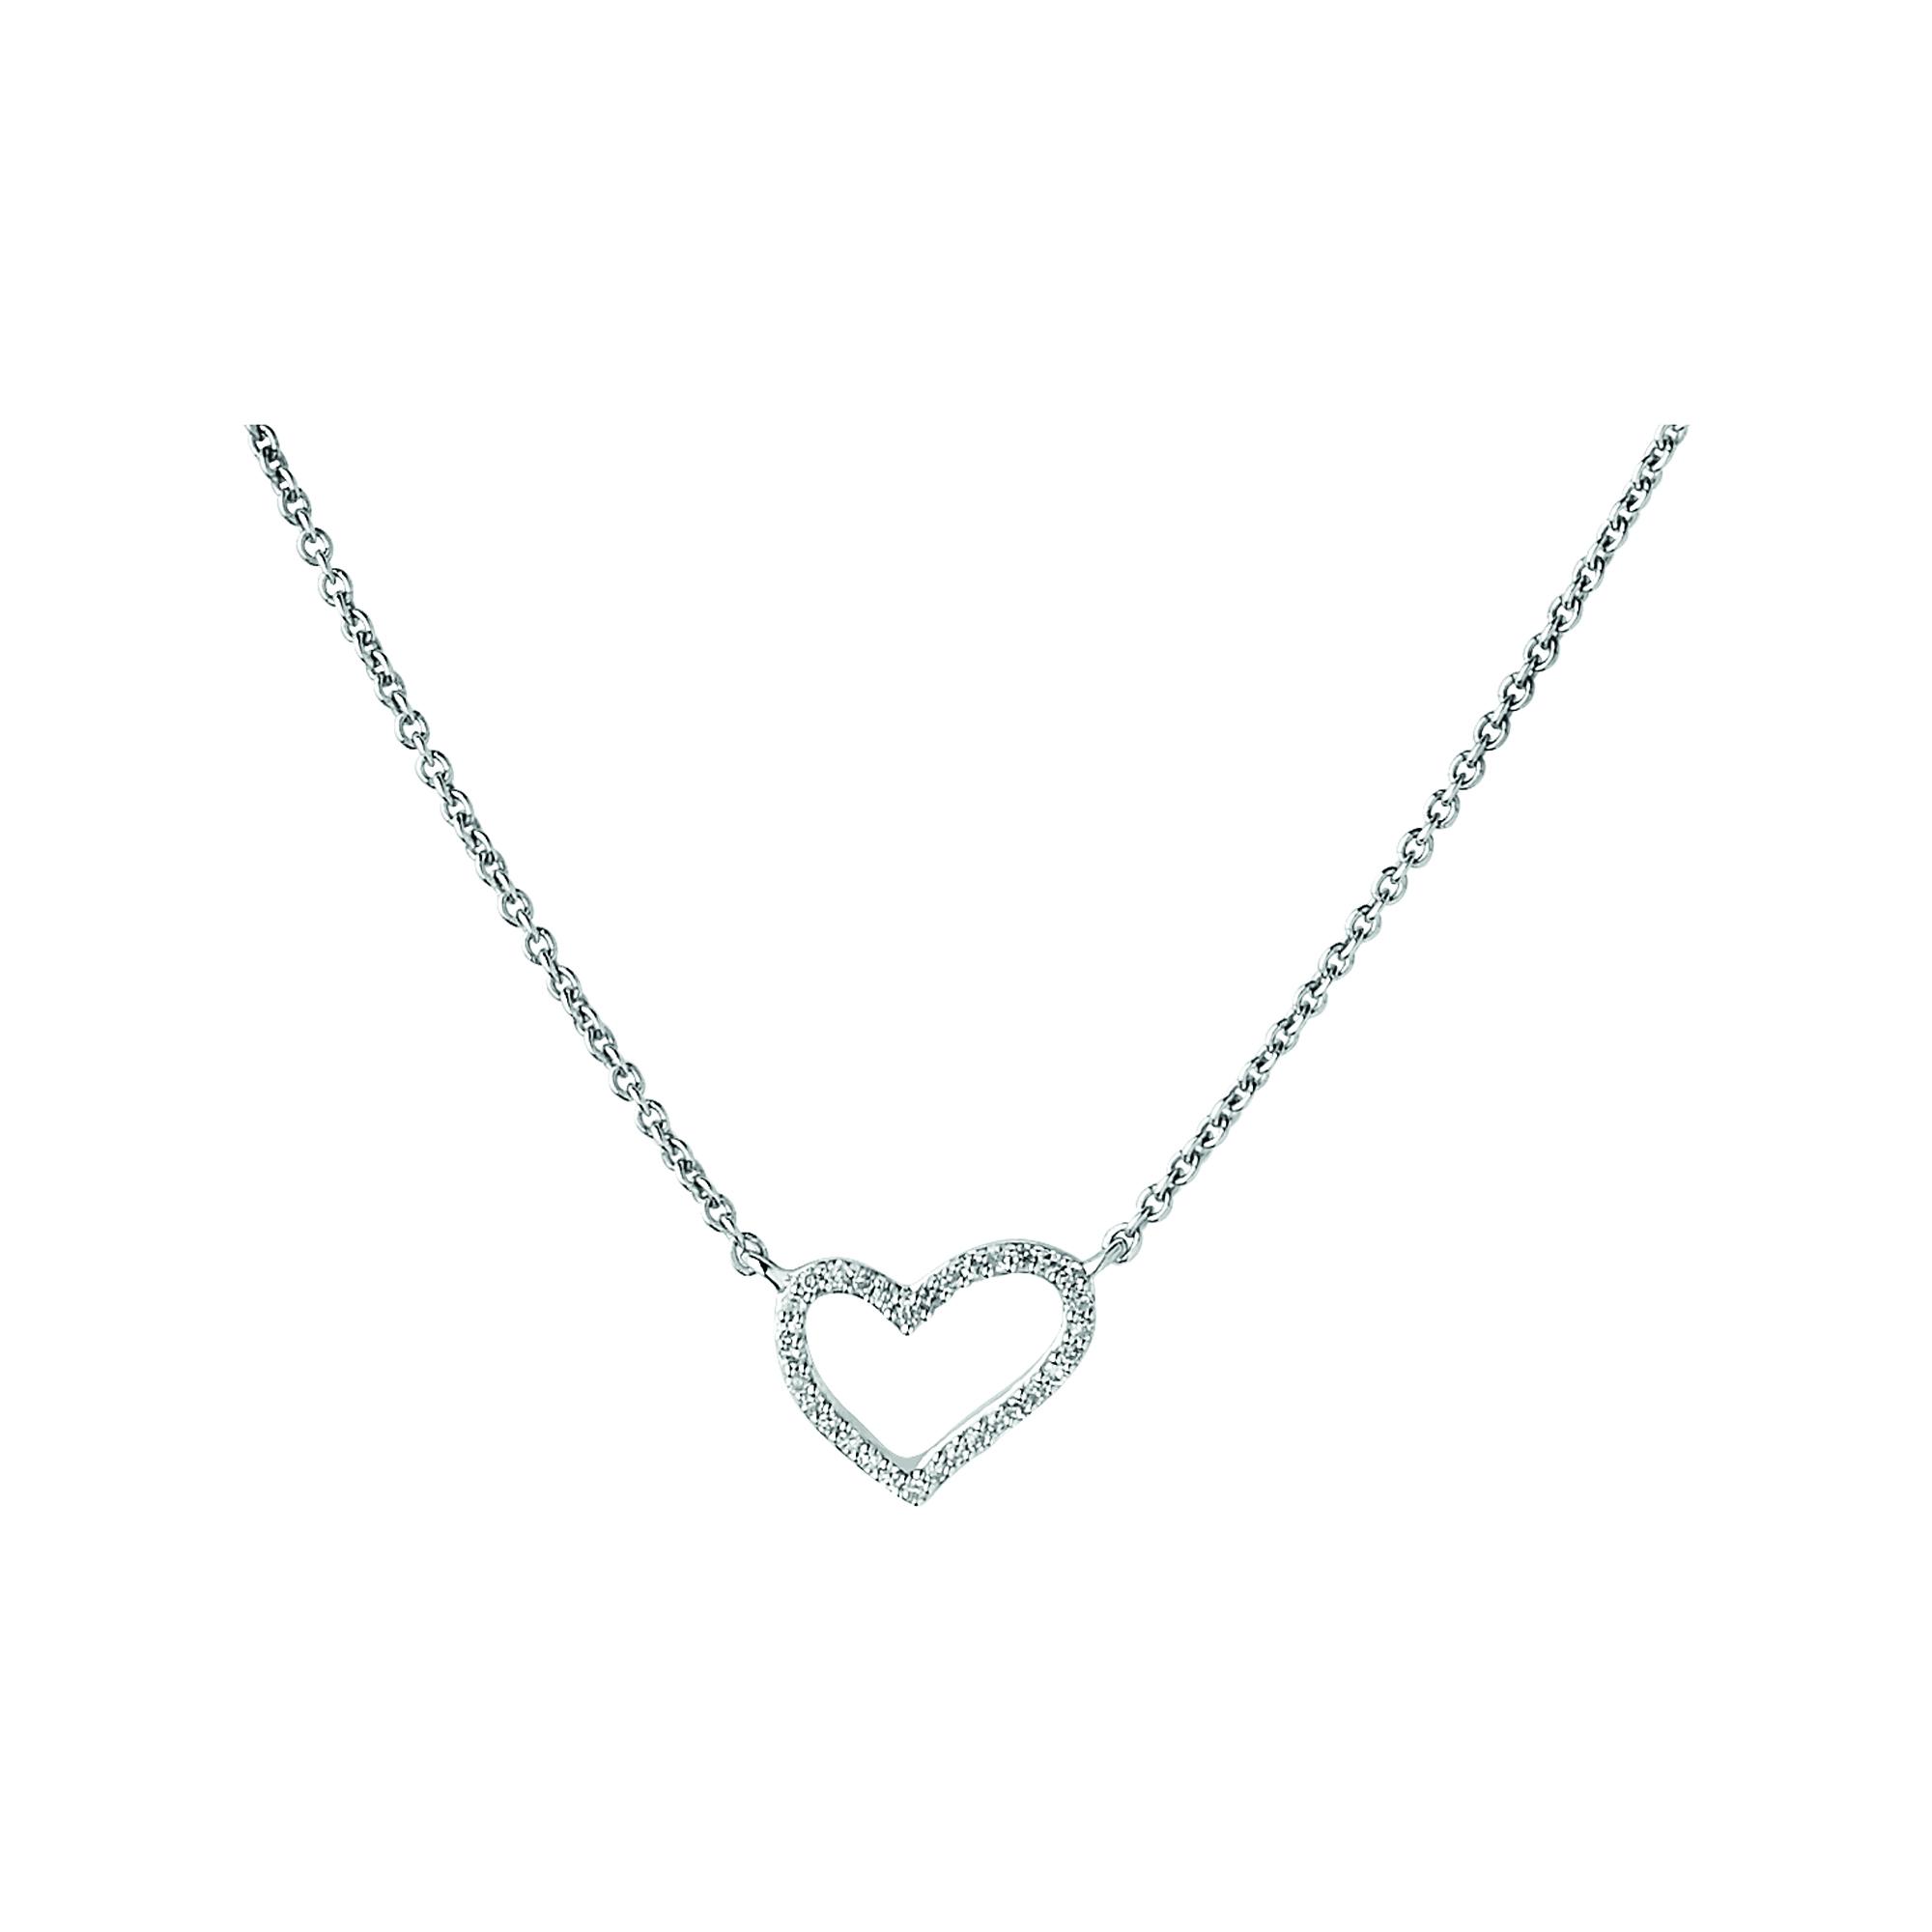 LINKS OF LONDON - Ασημένιο κολιέ Outlet N Heart γυναικεία αξεσουάρ κοσμήματα κολιέ